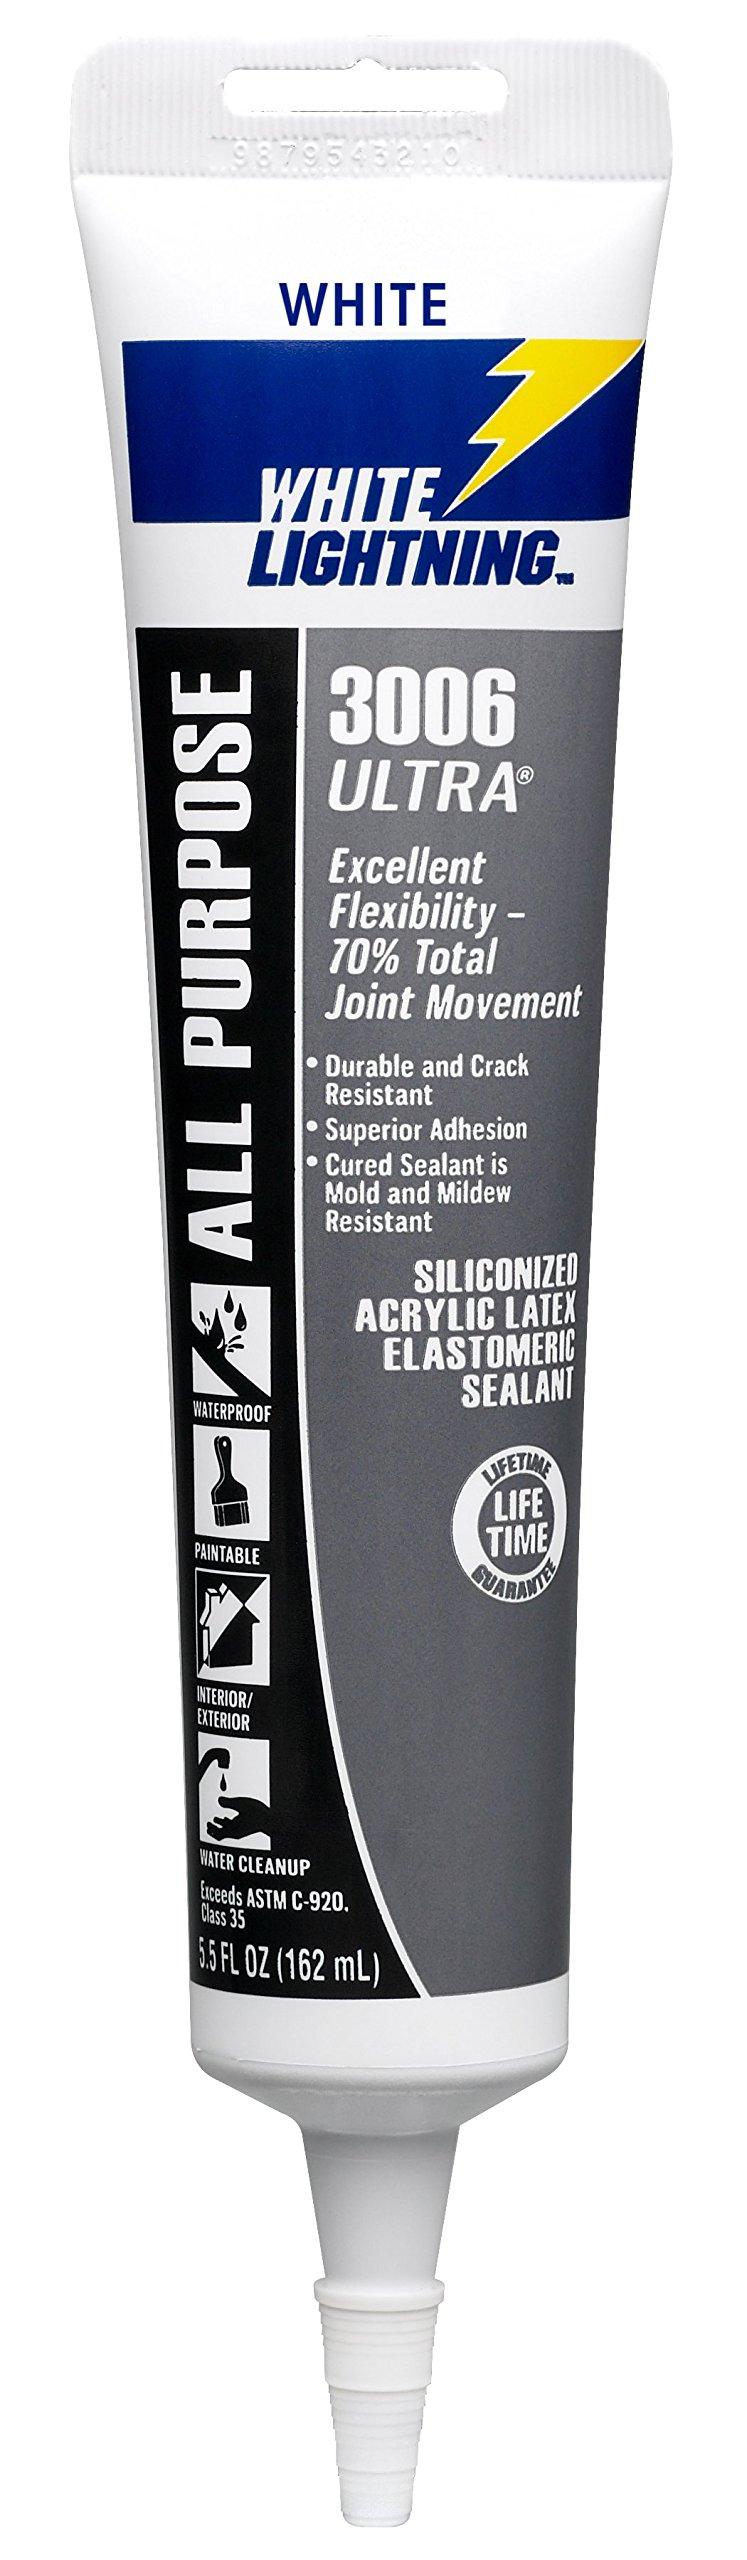 White Lightning W11000005 3006 ULTRA All Purpose Elastomeric Sealant, White, 5.5 ounce